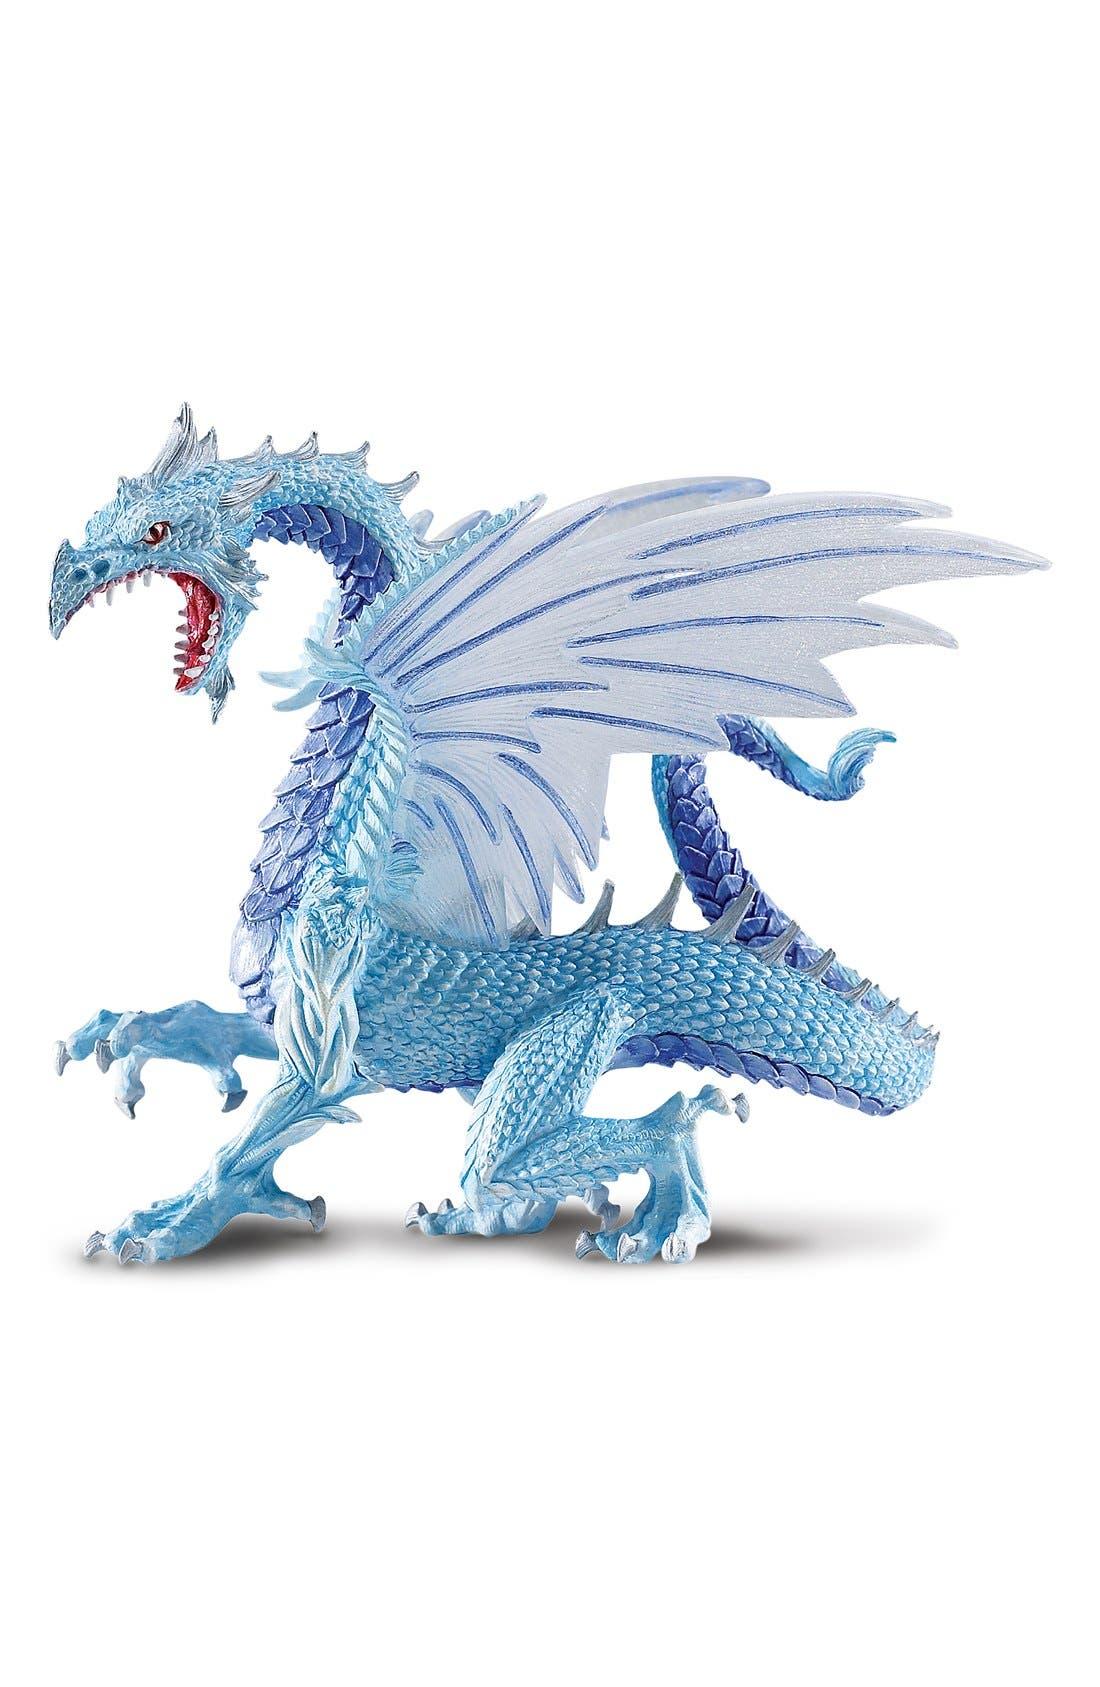 Main Image - Safari Ltd. Ice Dragon Figurine